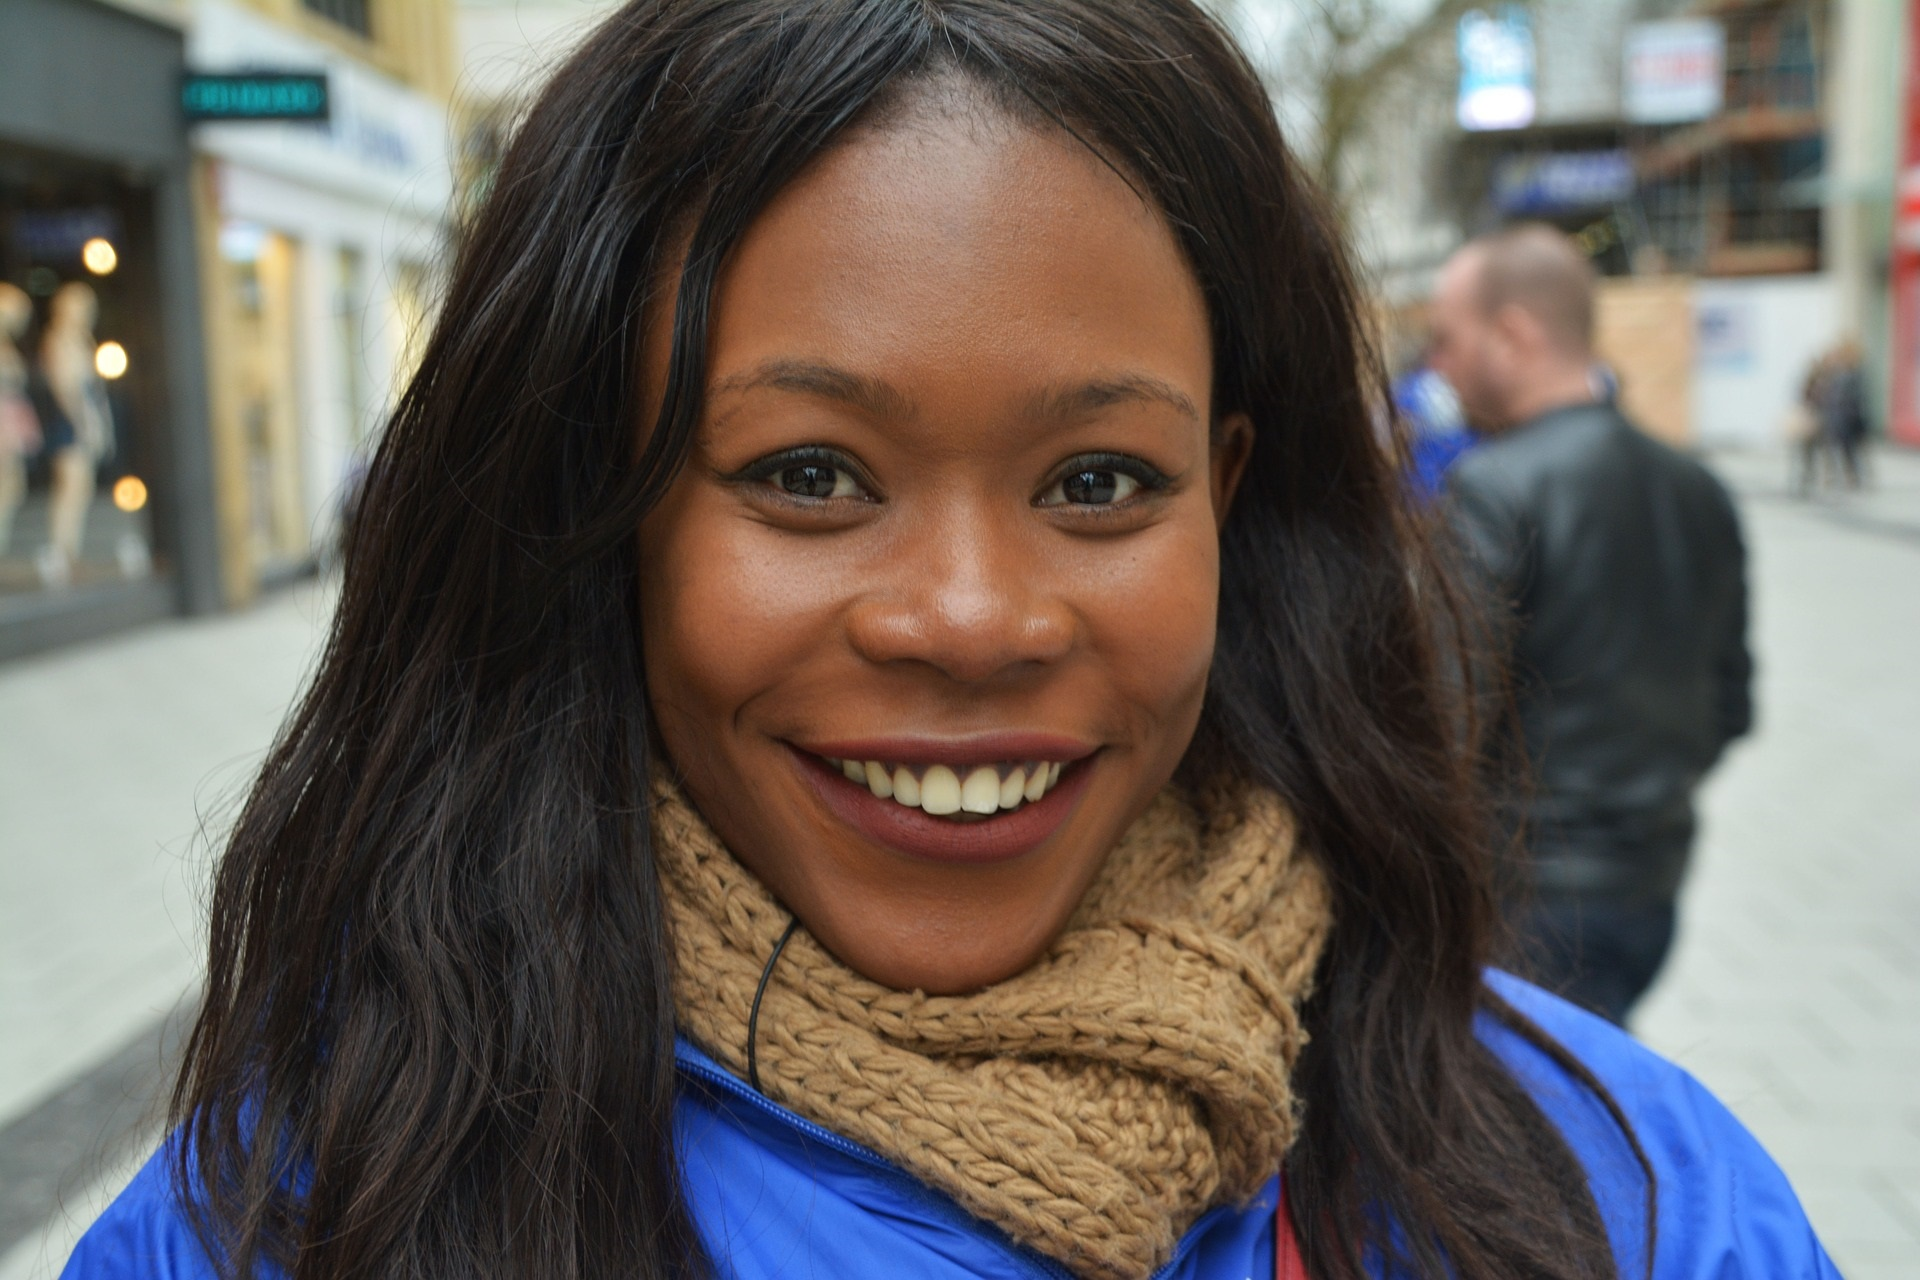 African American Black Woman in Blue Sweater